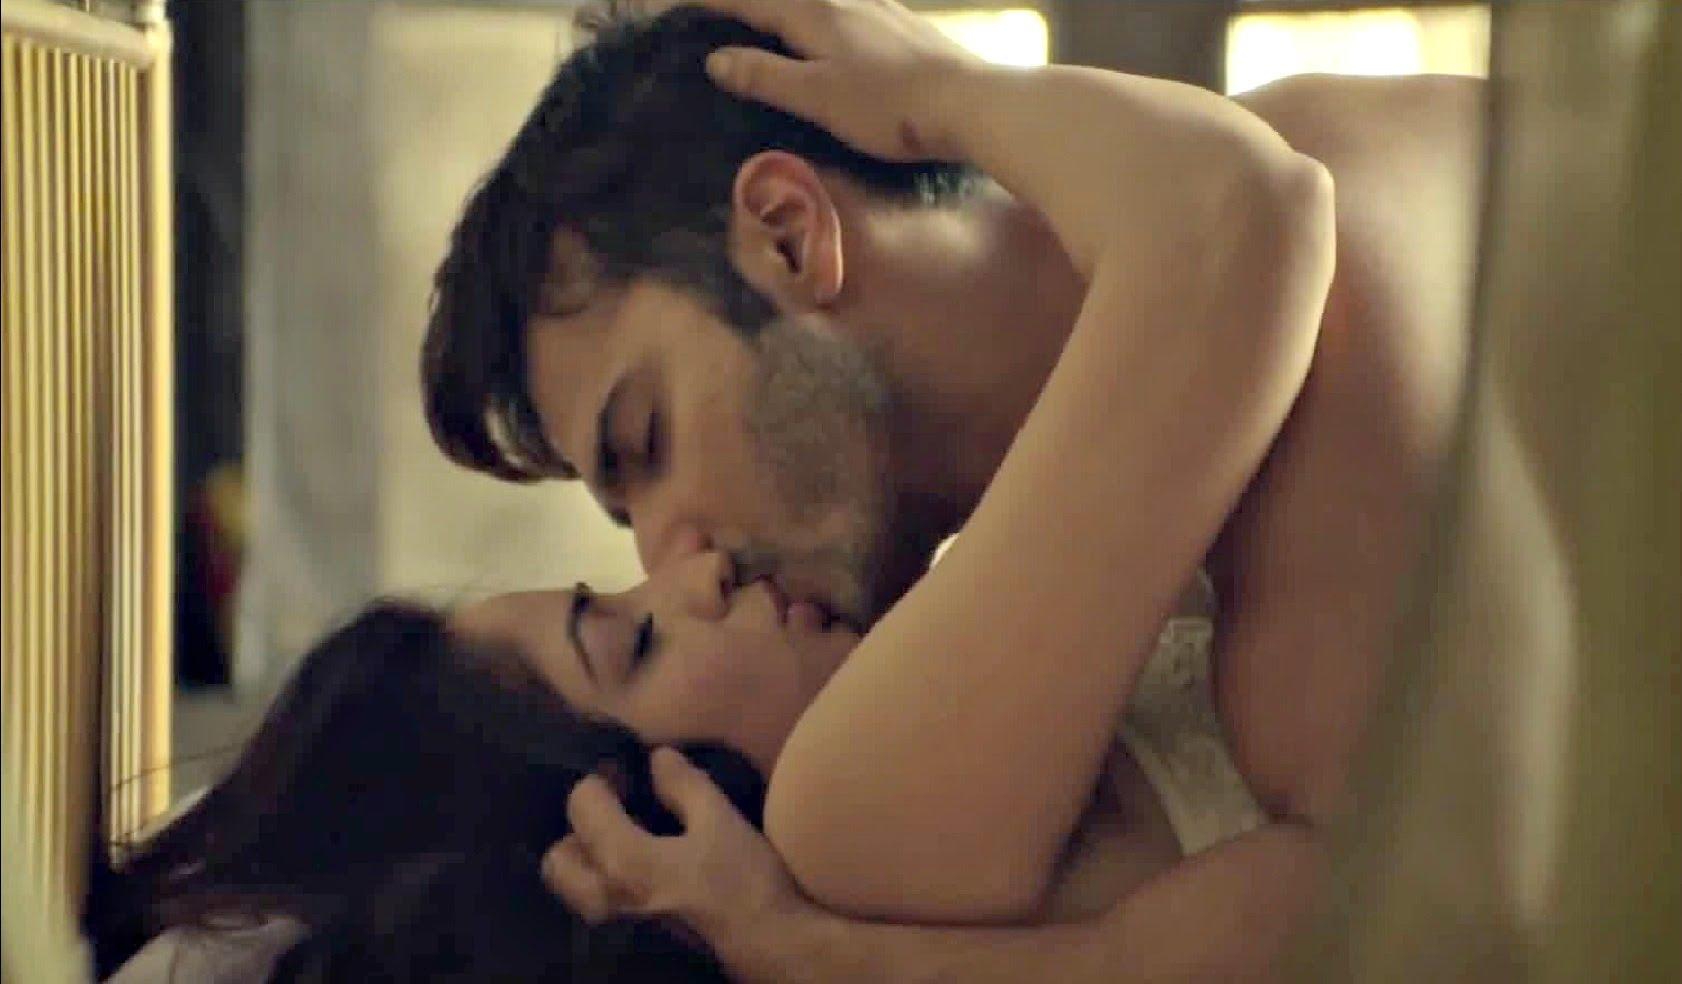 love awake free online dating bangladesh service: is varun dhawan dating ileana d cruz new photos